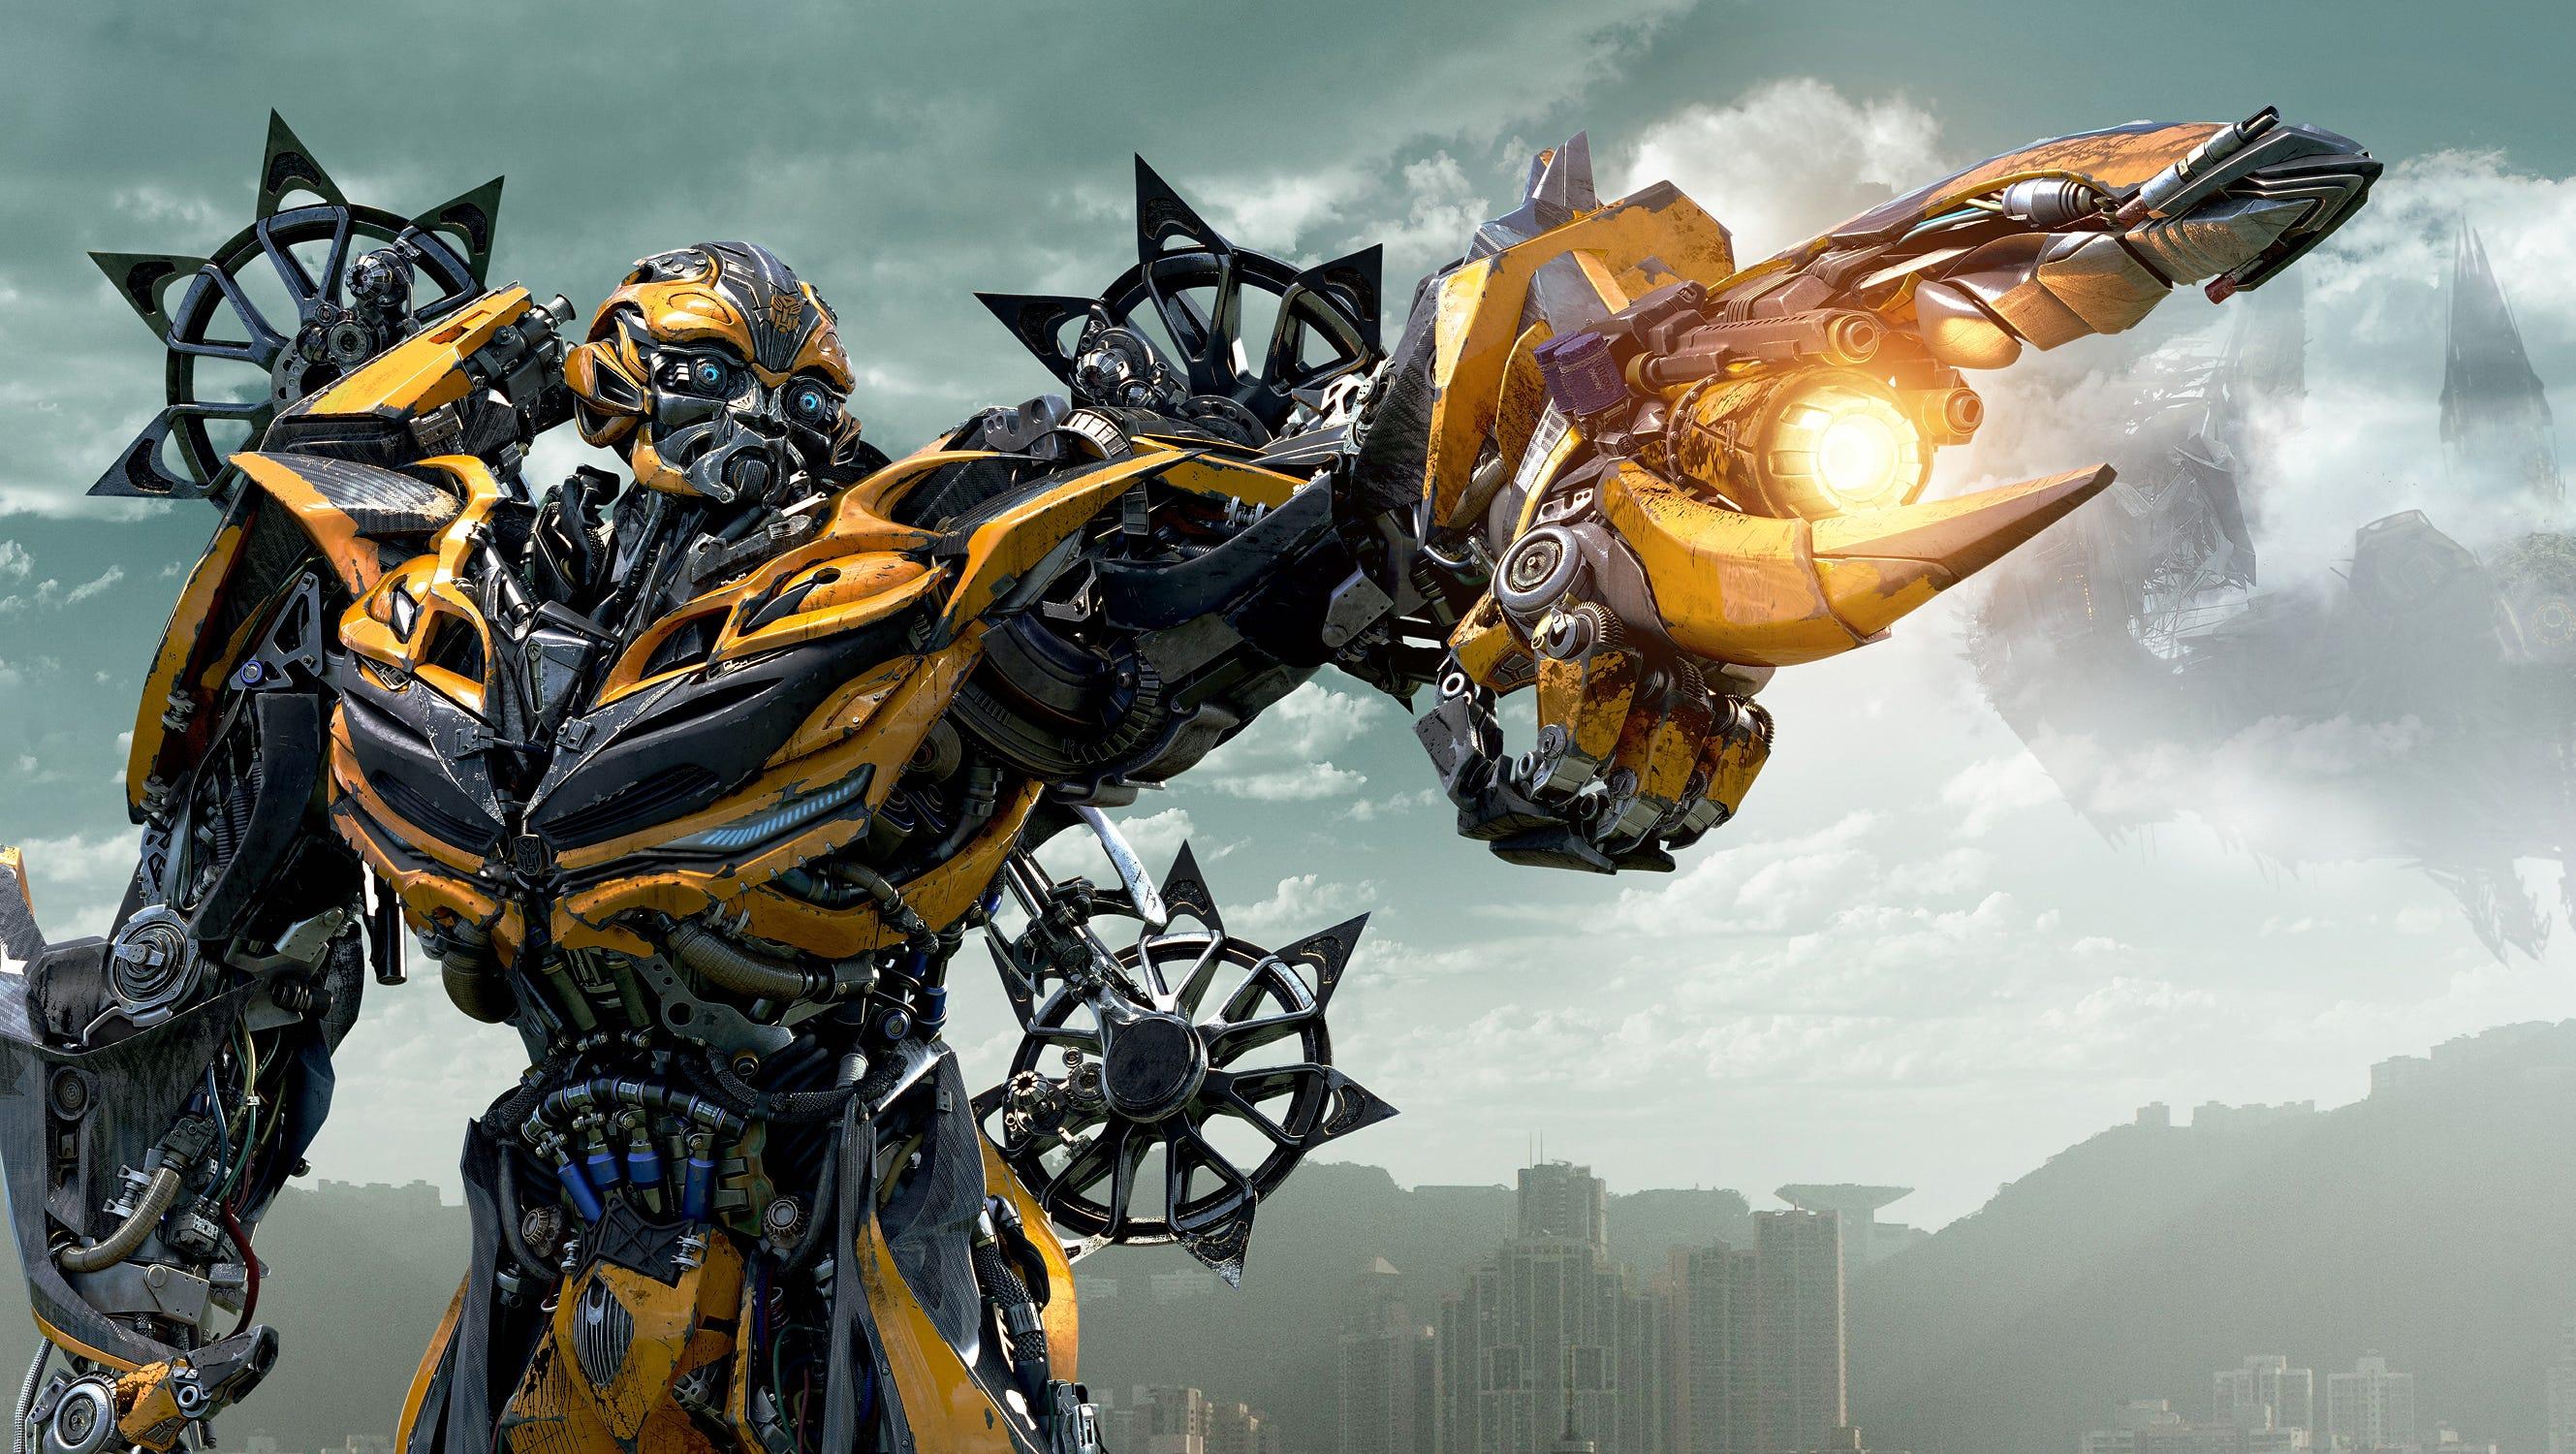 Transformers 4' brings new looks, weapons